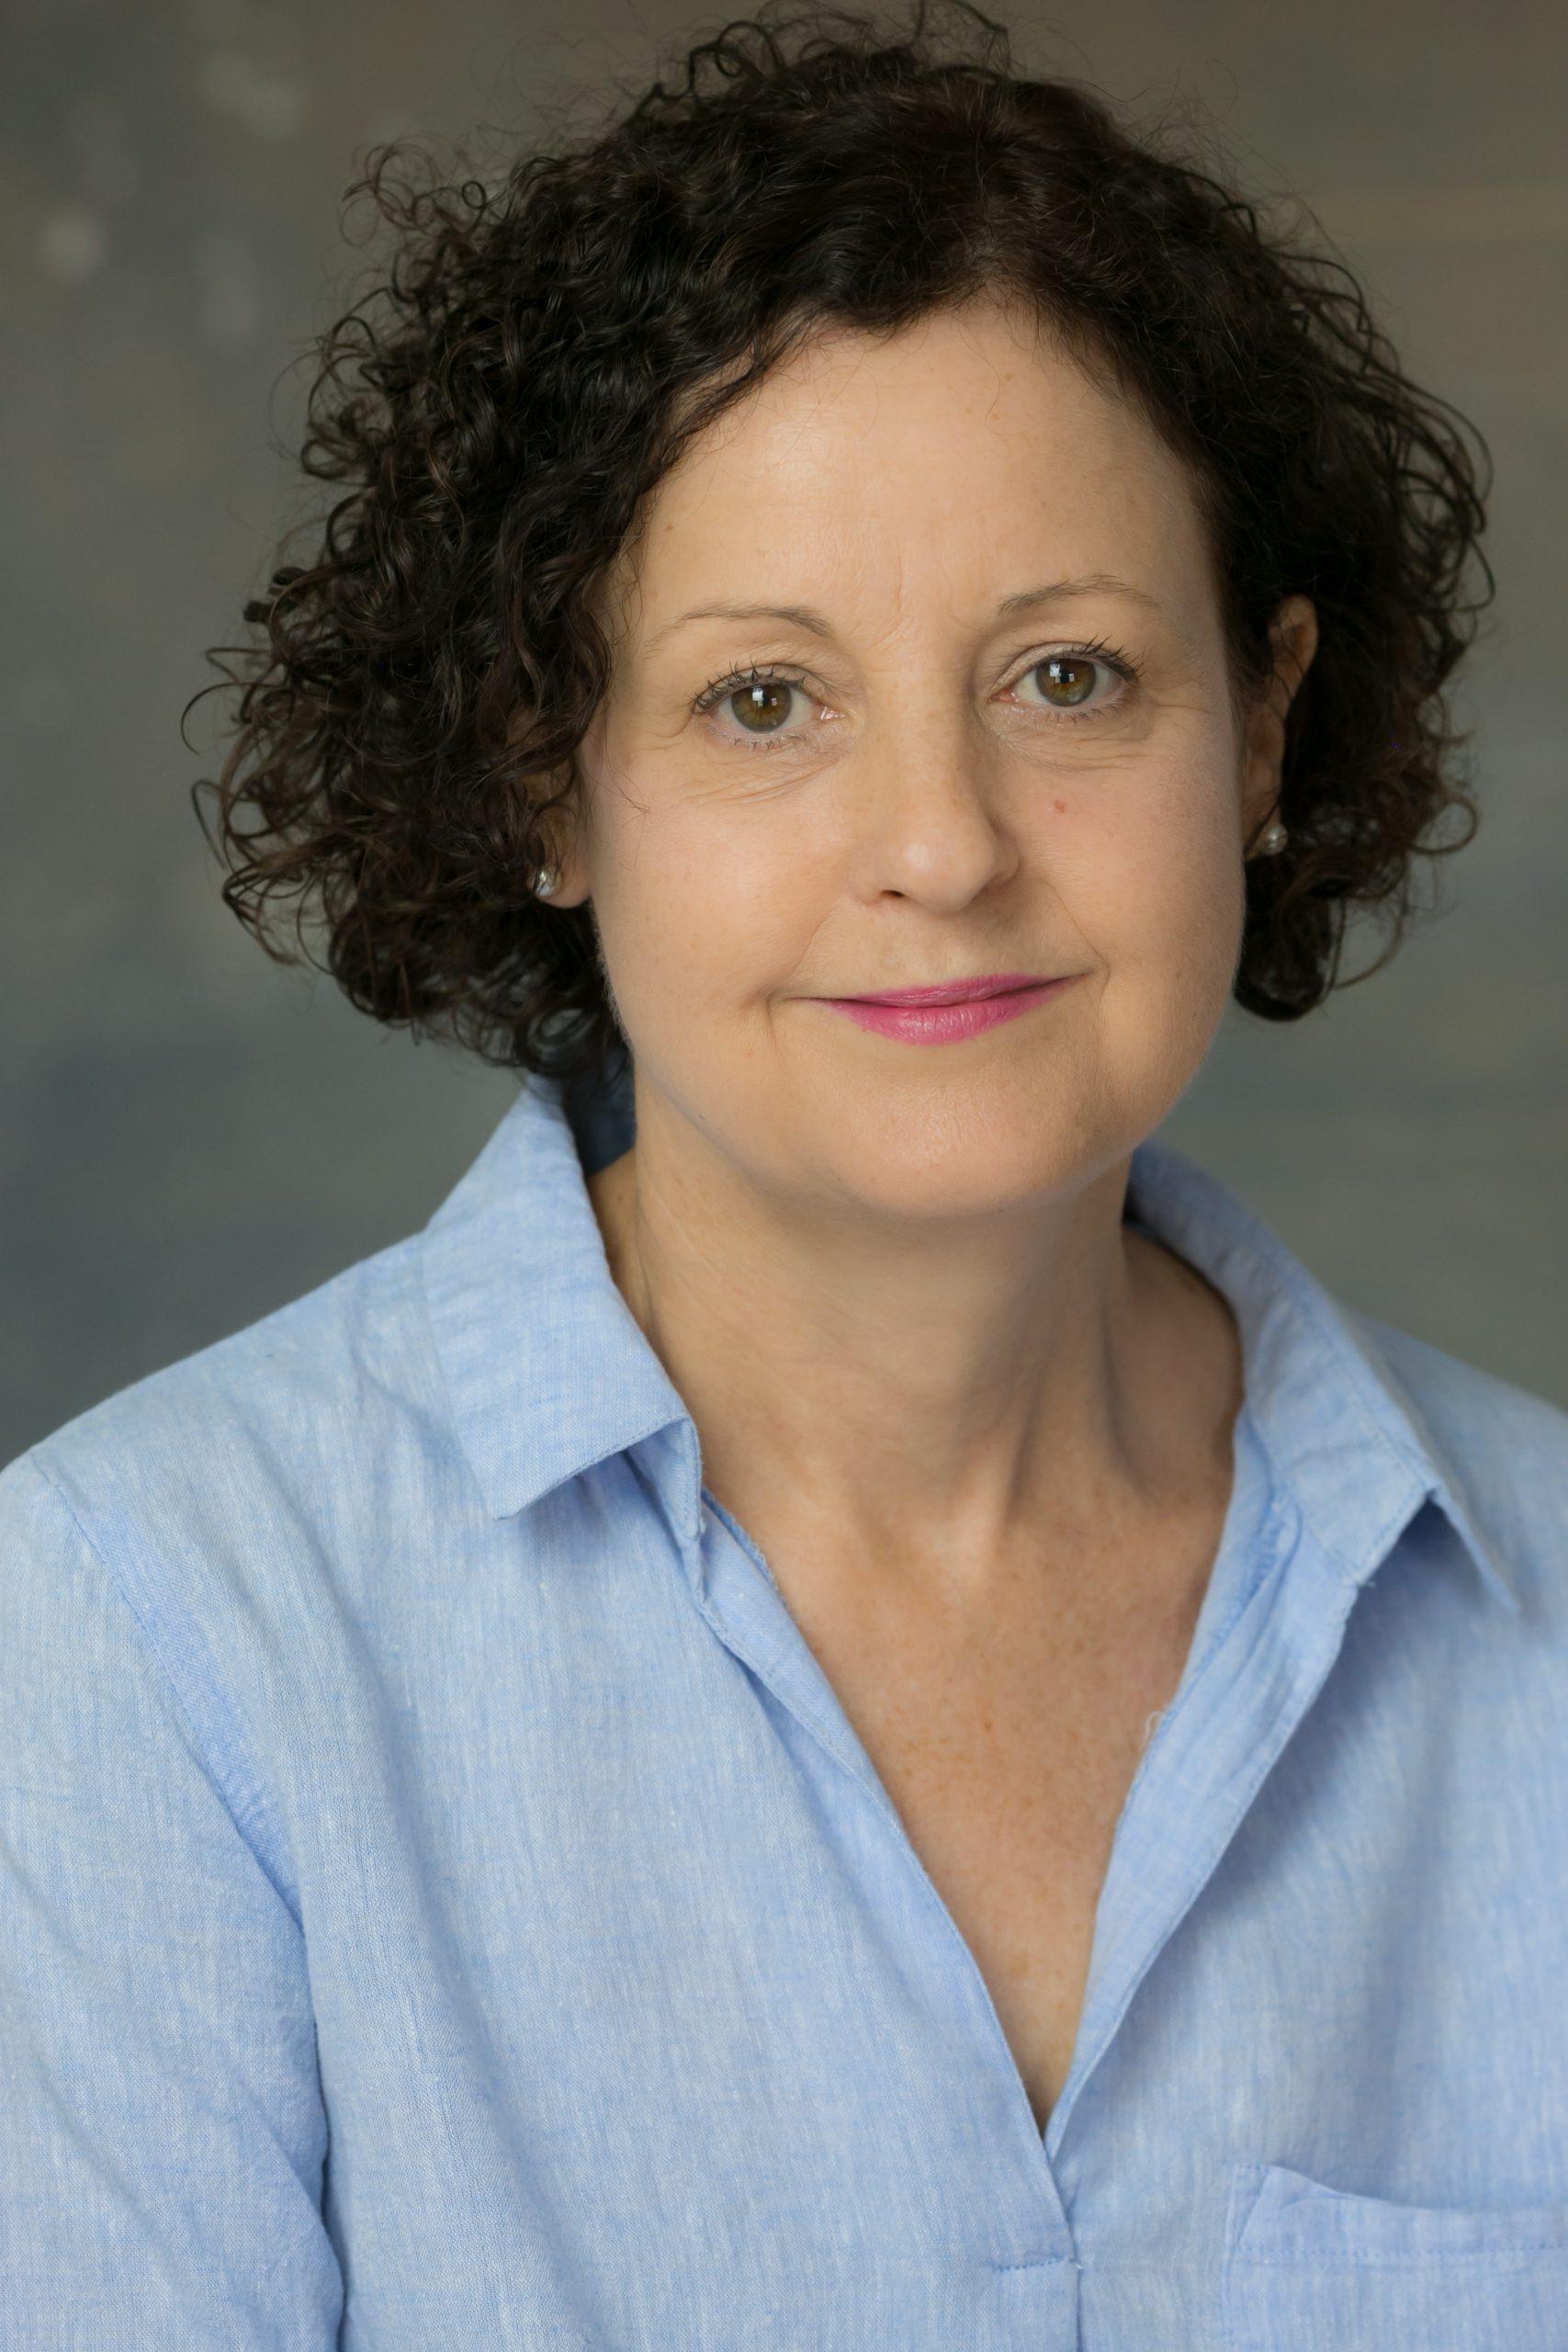 Susan Twist - Jane Hollowood